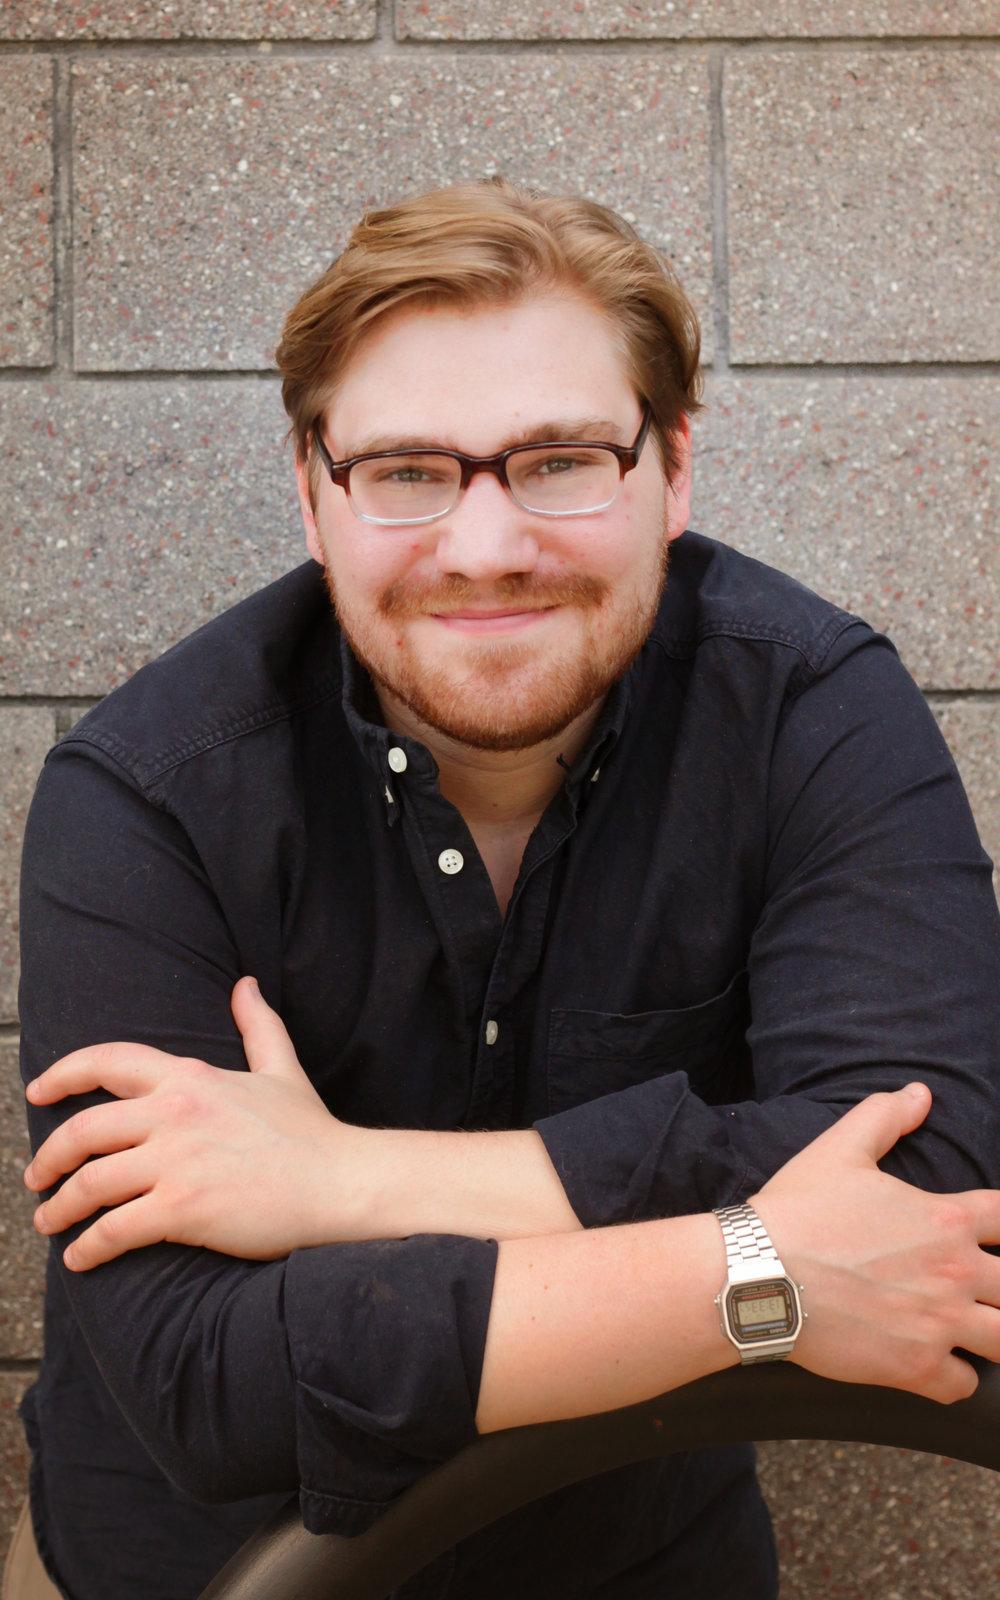 ComposerMichael-Alexander Brandstetter - Composer Michael-Alexander Brandstetter at Remote Control Productions